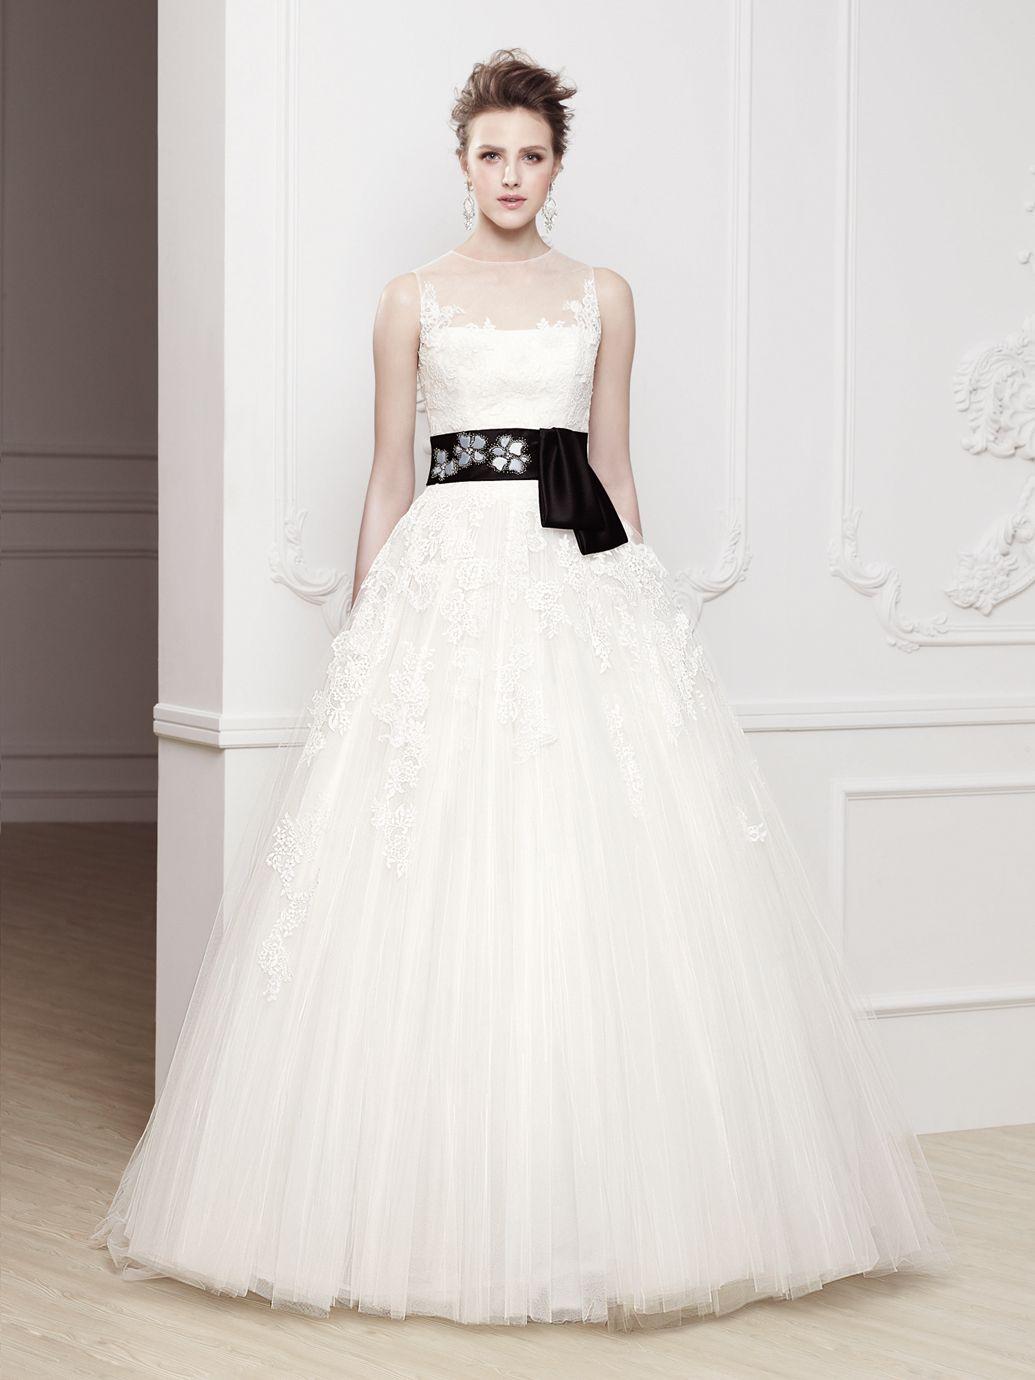 Blue grey wedding dress  OLGA  Blue Collection  Enzoani  Available Colours  IvoryBlack